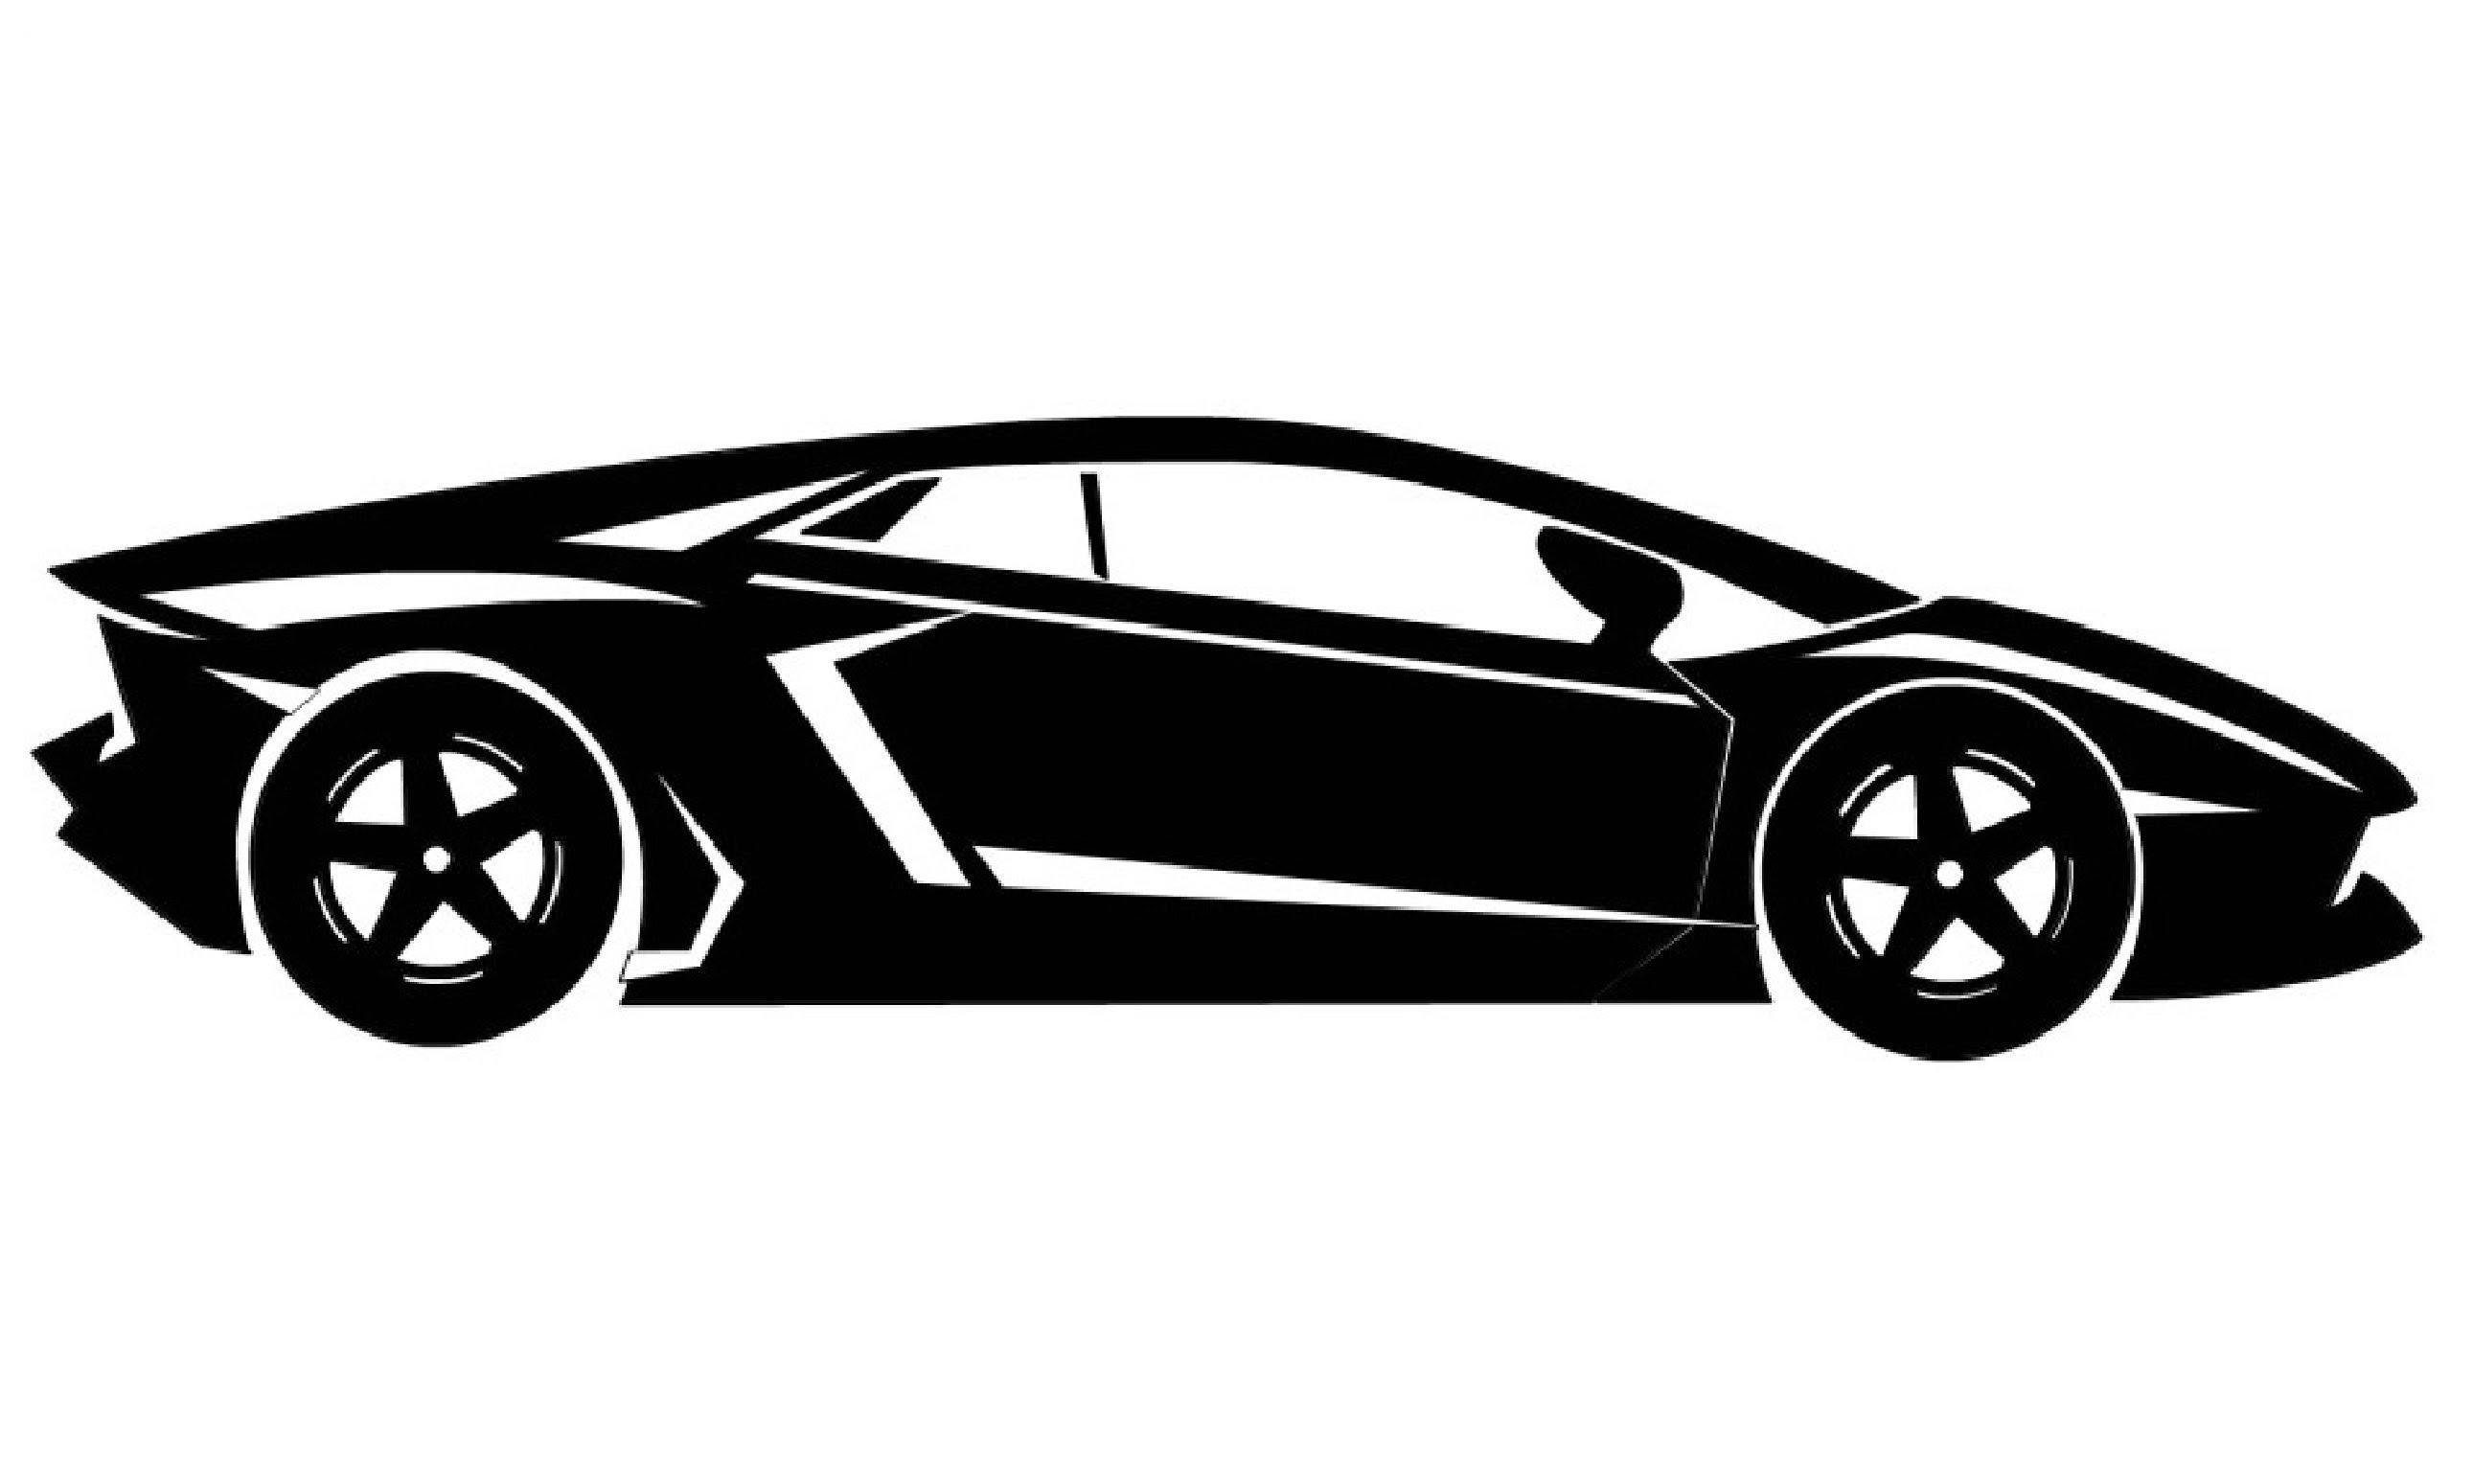 Lamborghini Reventon Drawing   Free download on ClipArtMag (2581 x 1549 Pixel)